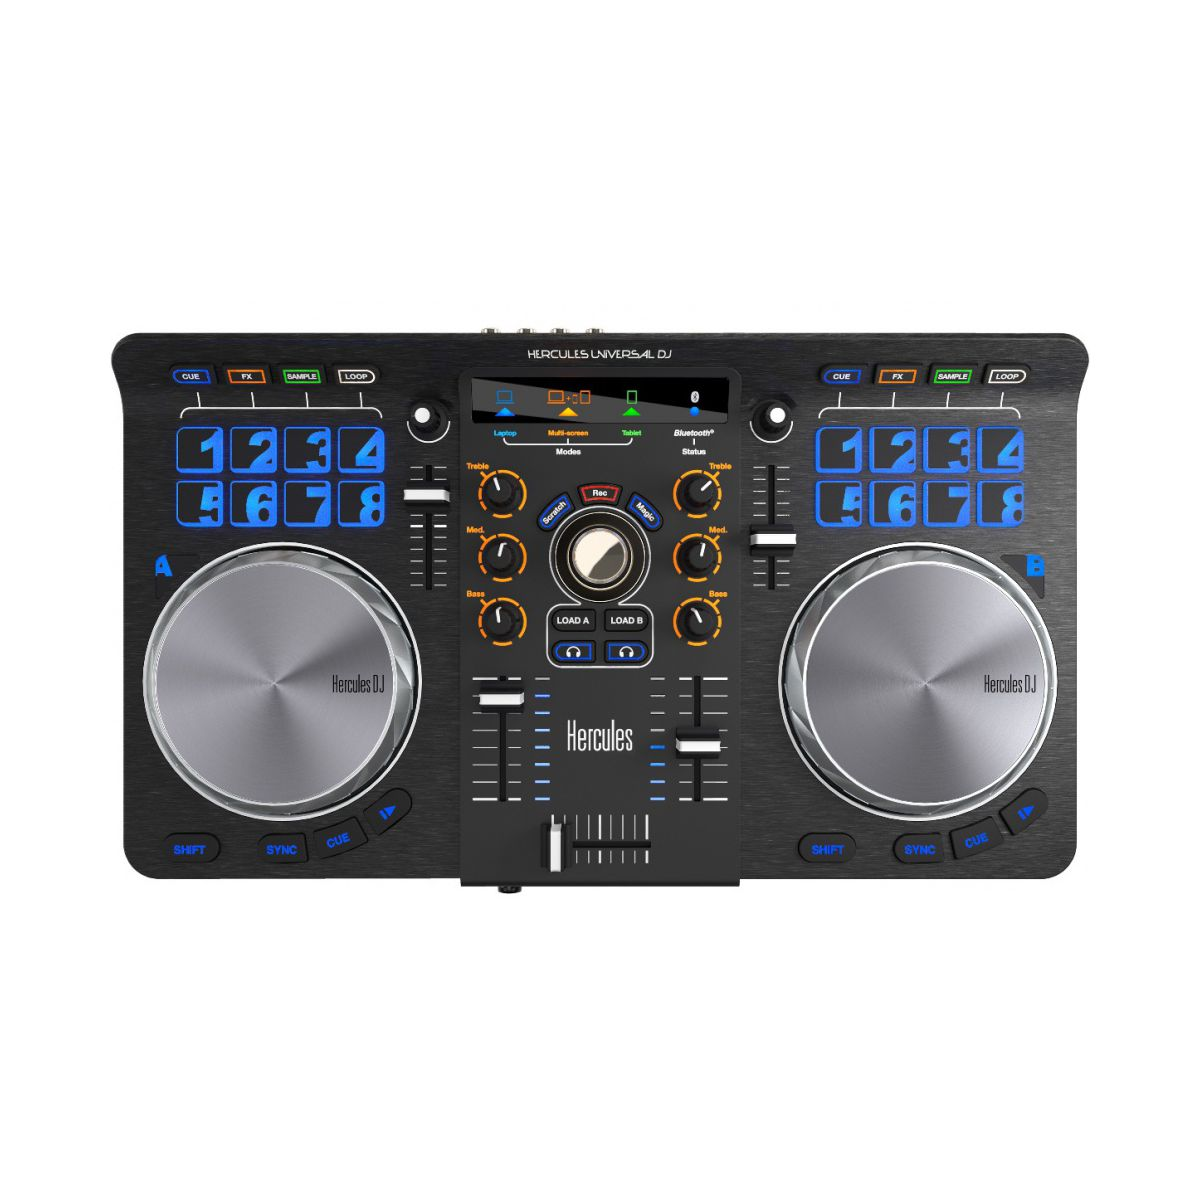 Table de mixage HERCULES UNIVERSAL DJ (photo)